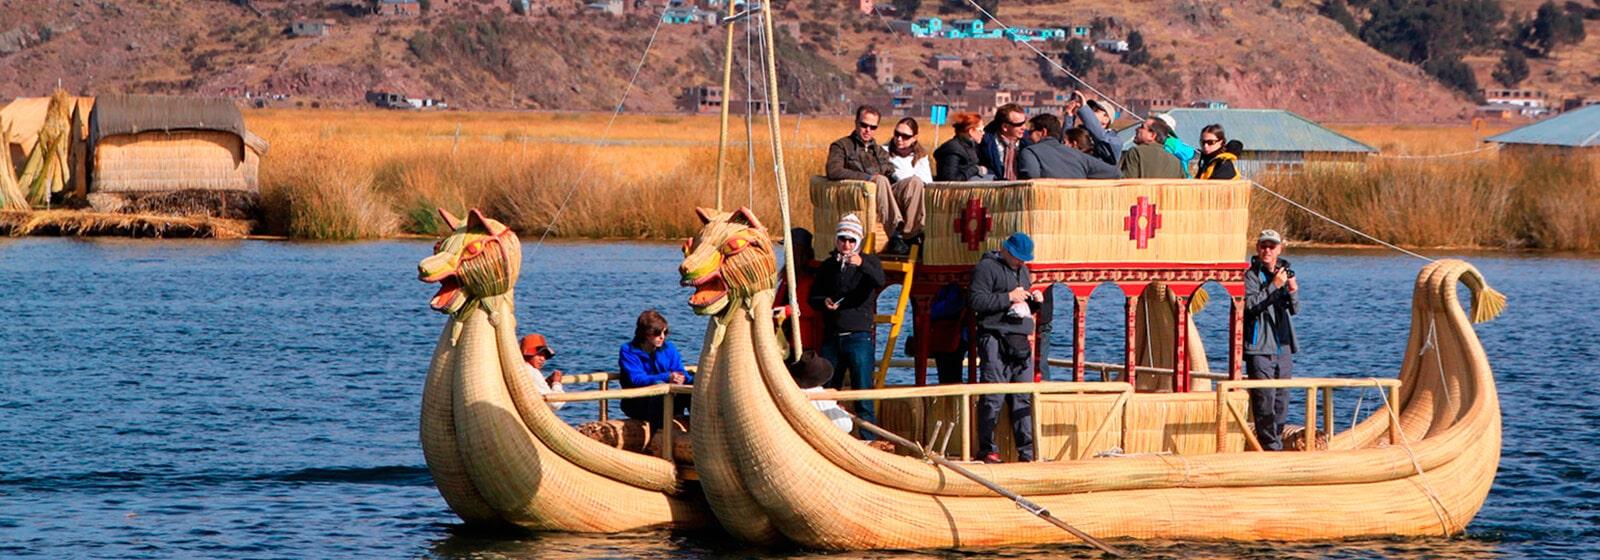 lago-titicaca-min